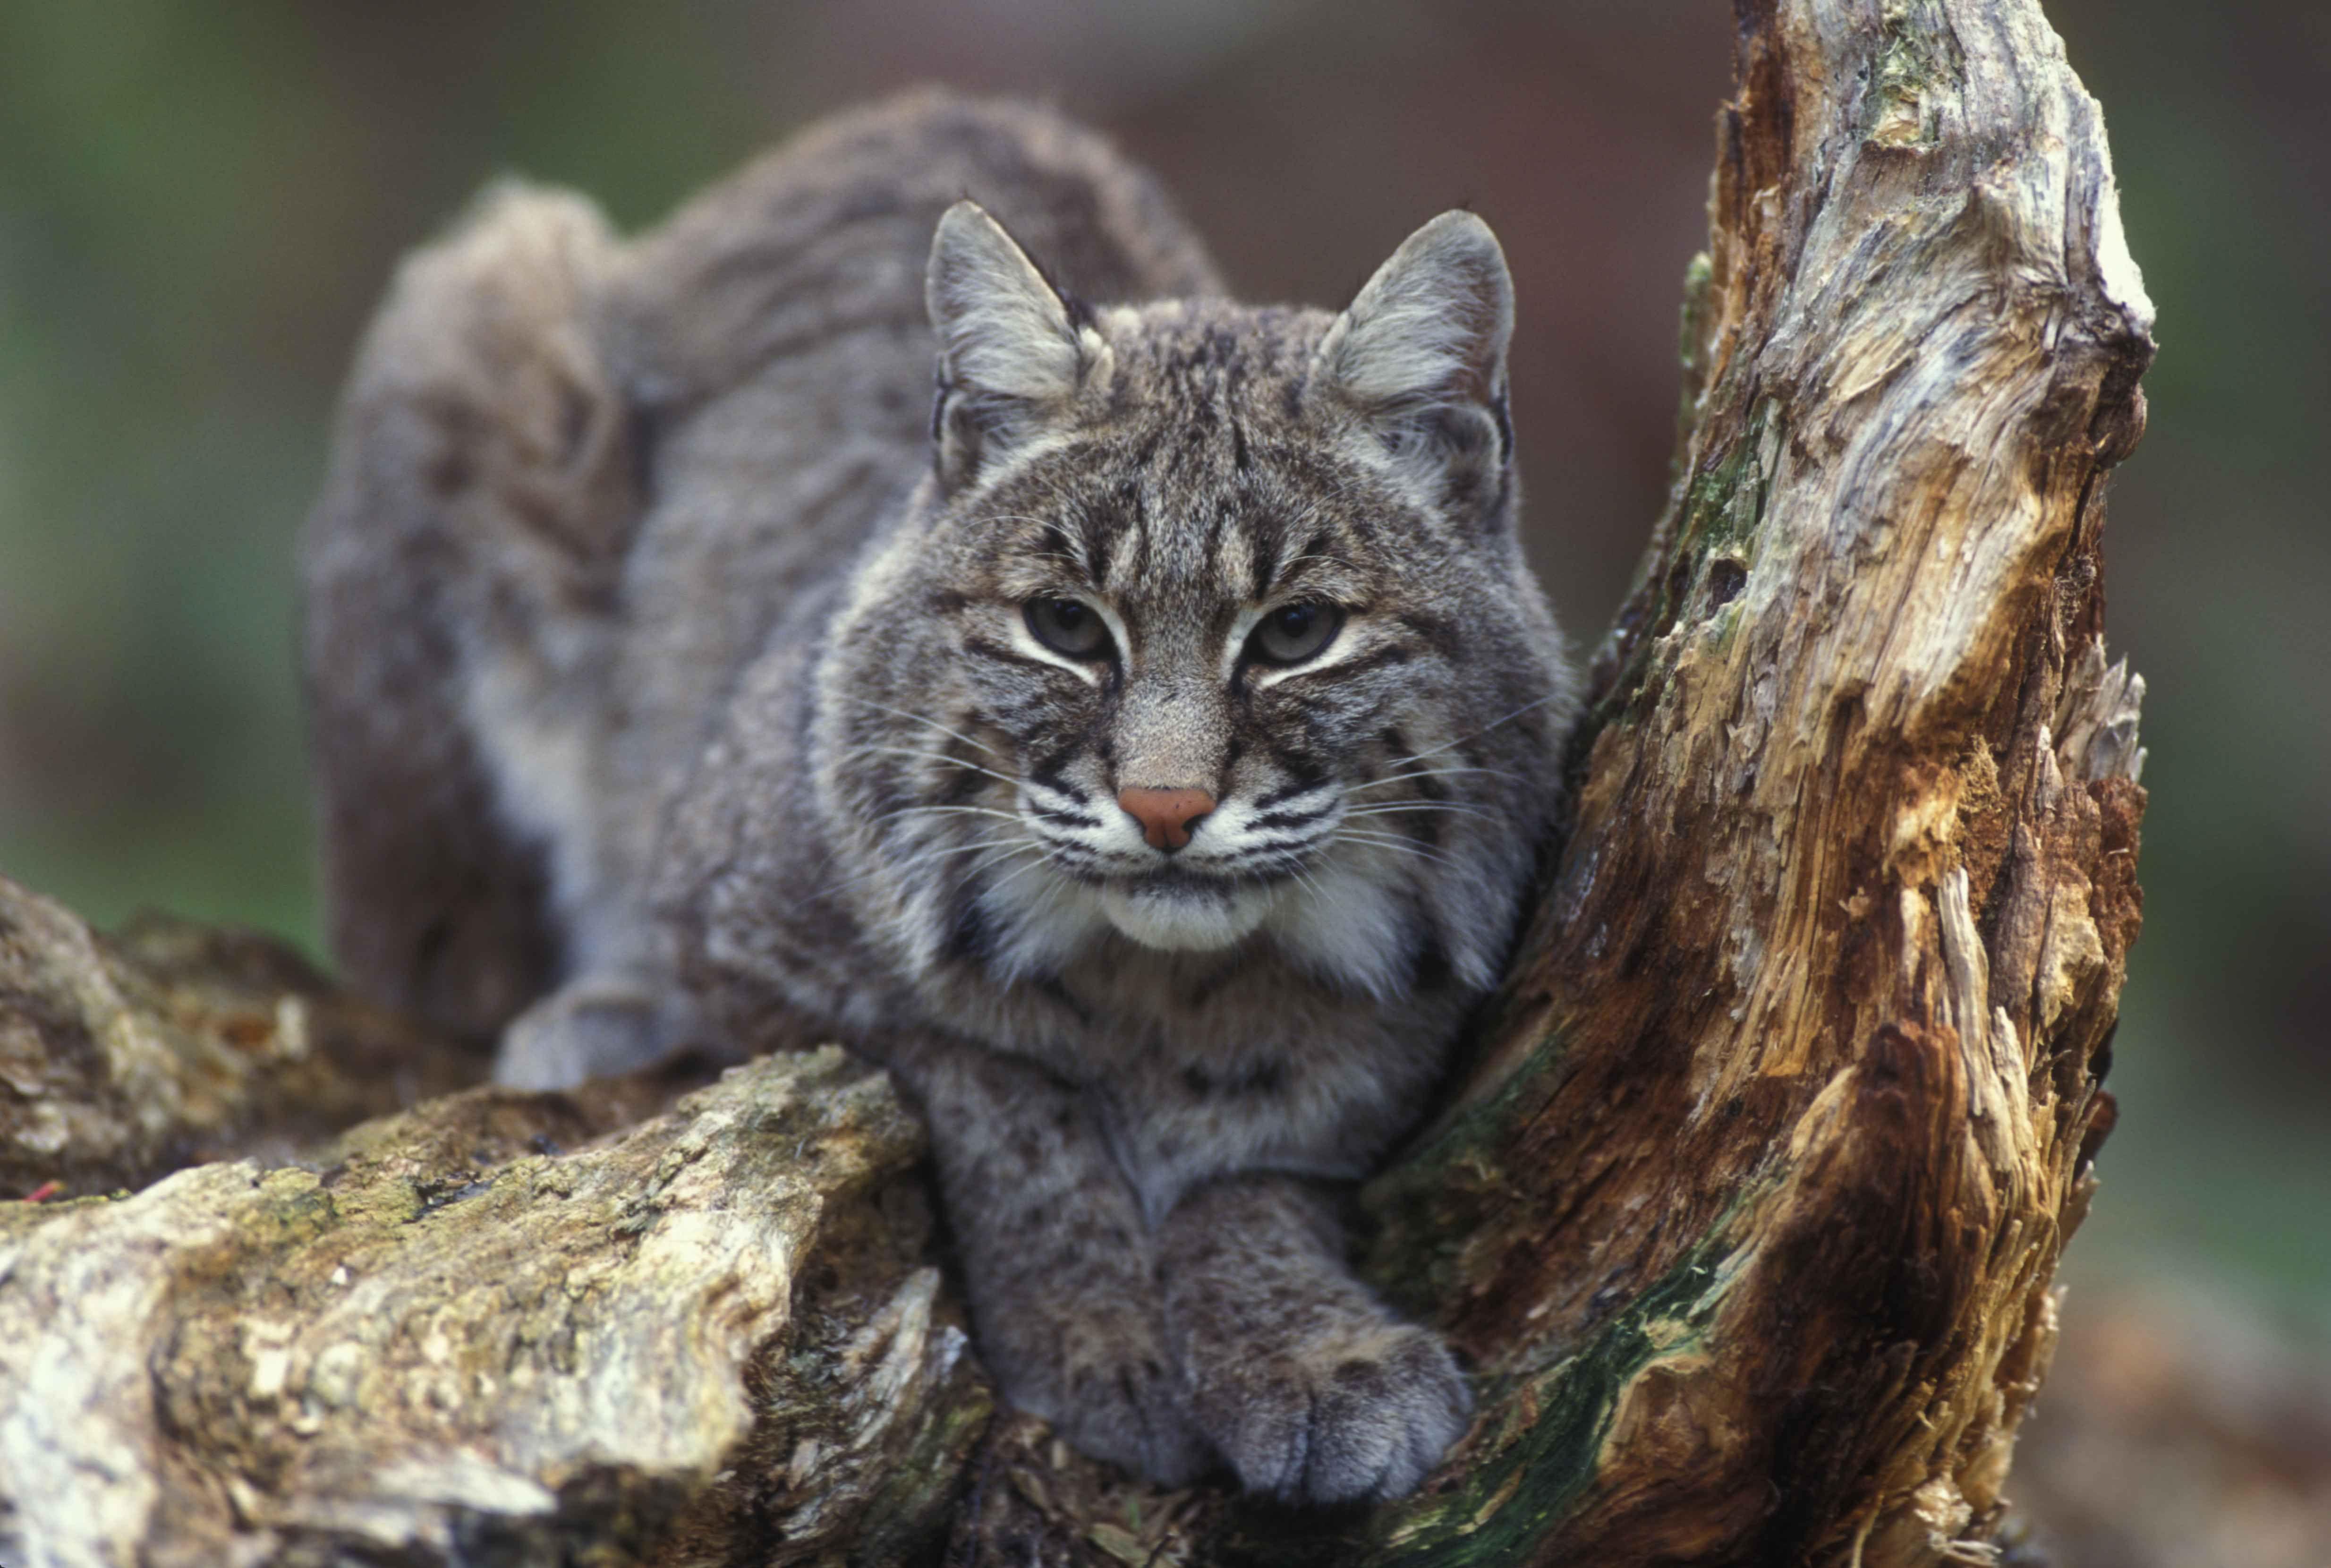 Bobcat in a tree (4936×3320) Wild cats, Animals, Cat care